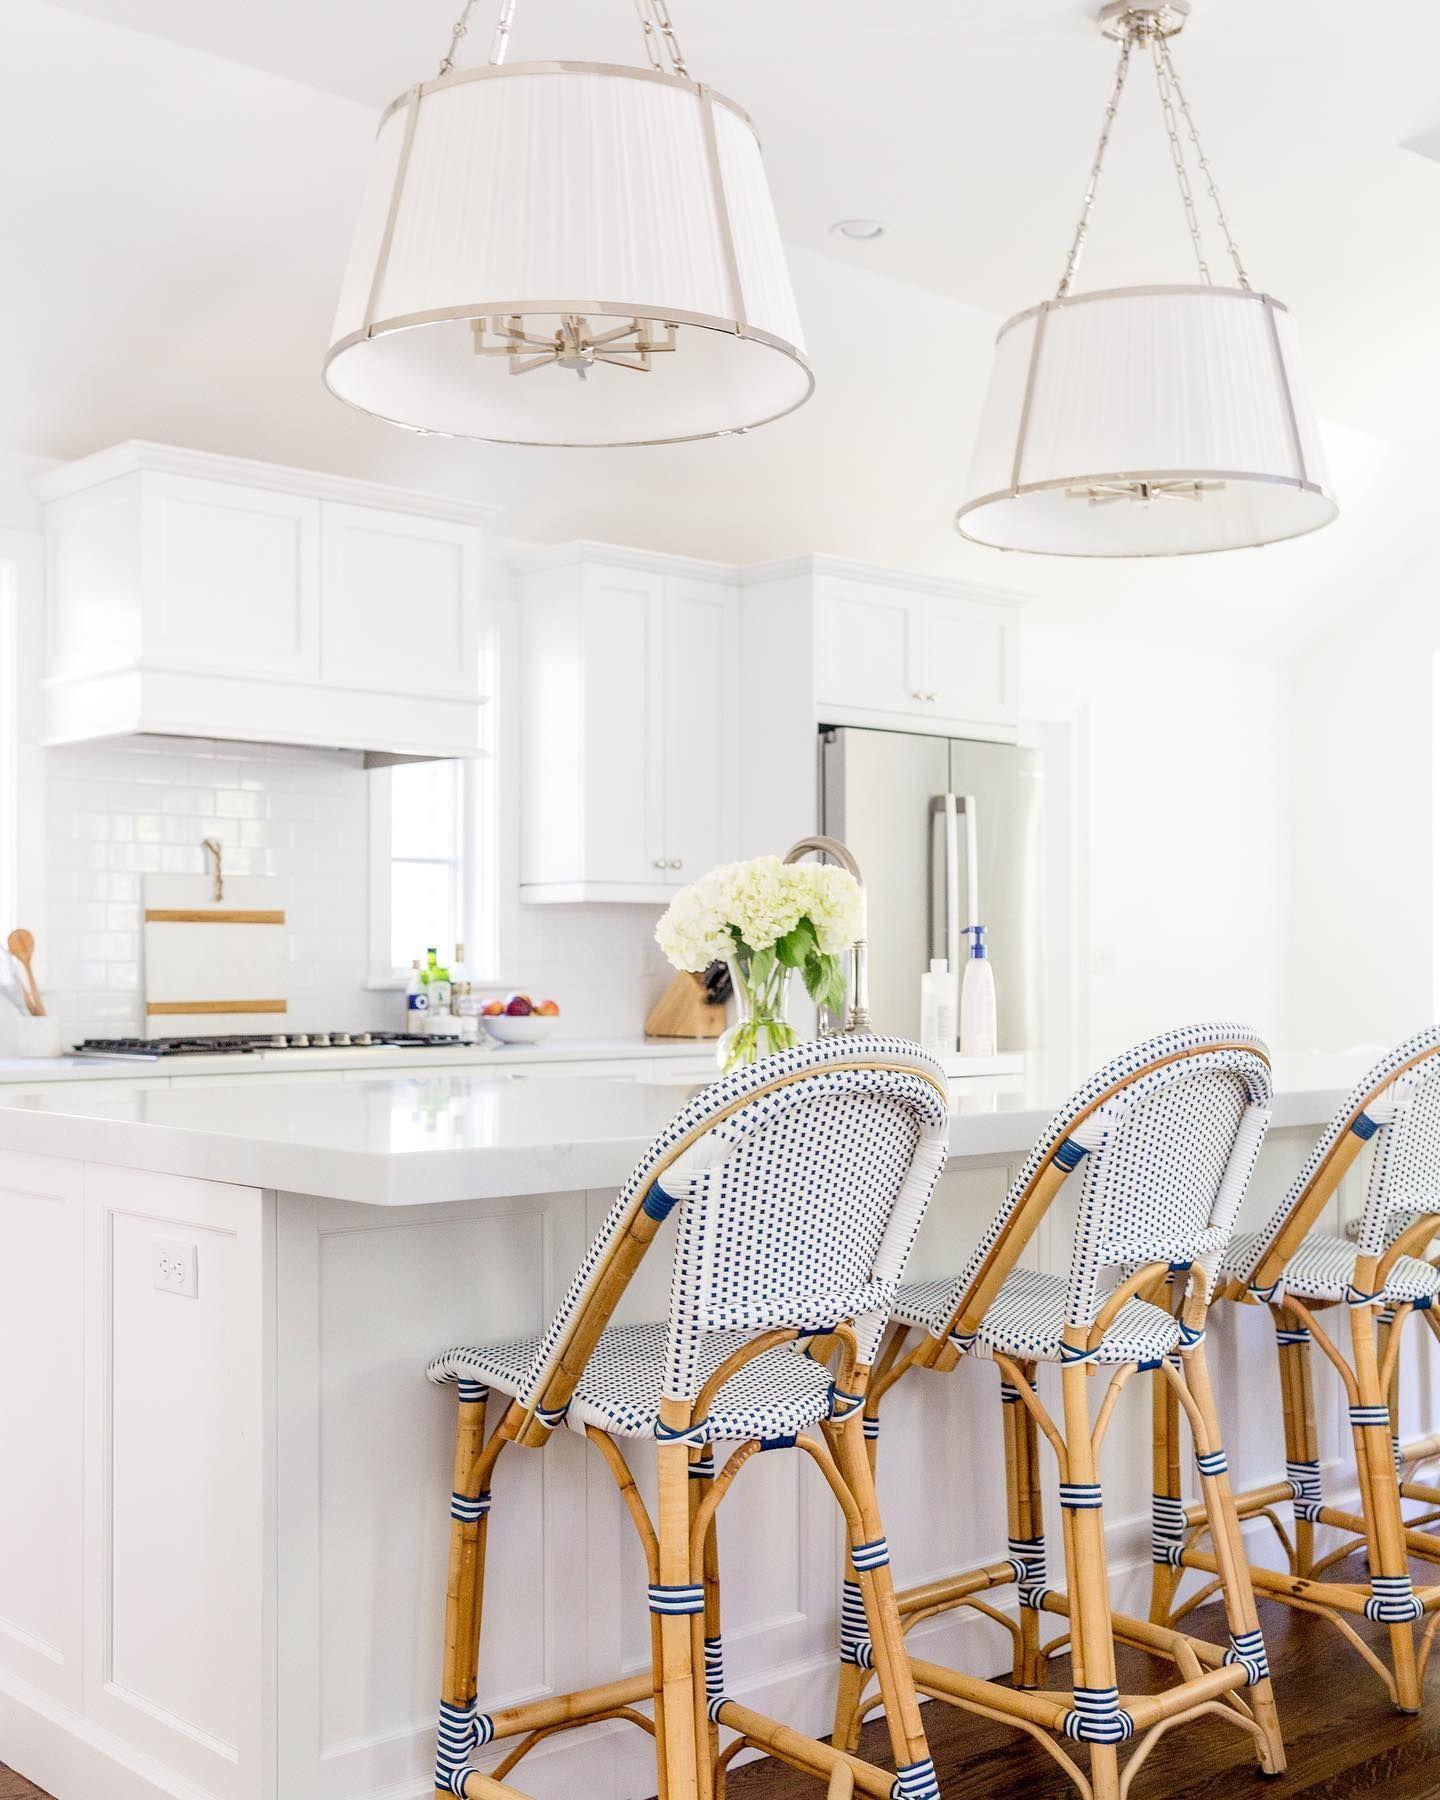 Pin By Mcarolinapirillo On House In 2021 Kitchen Inspiration Design Counter Stools Beautiful Kitchen Designs